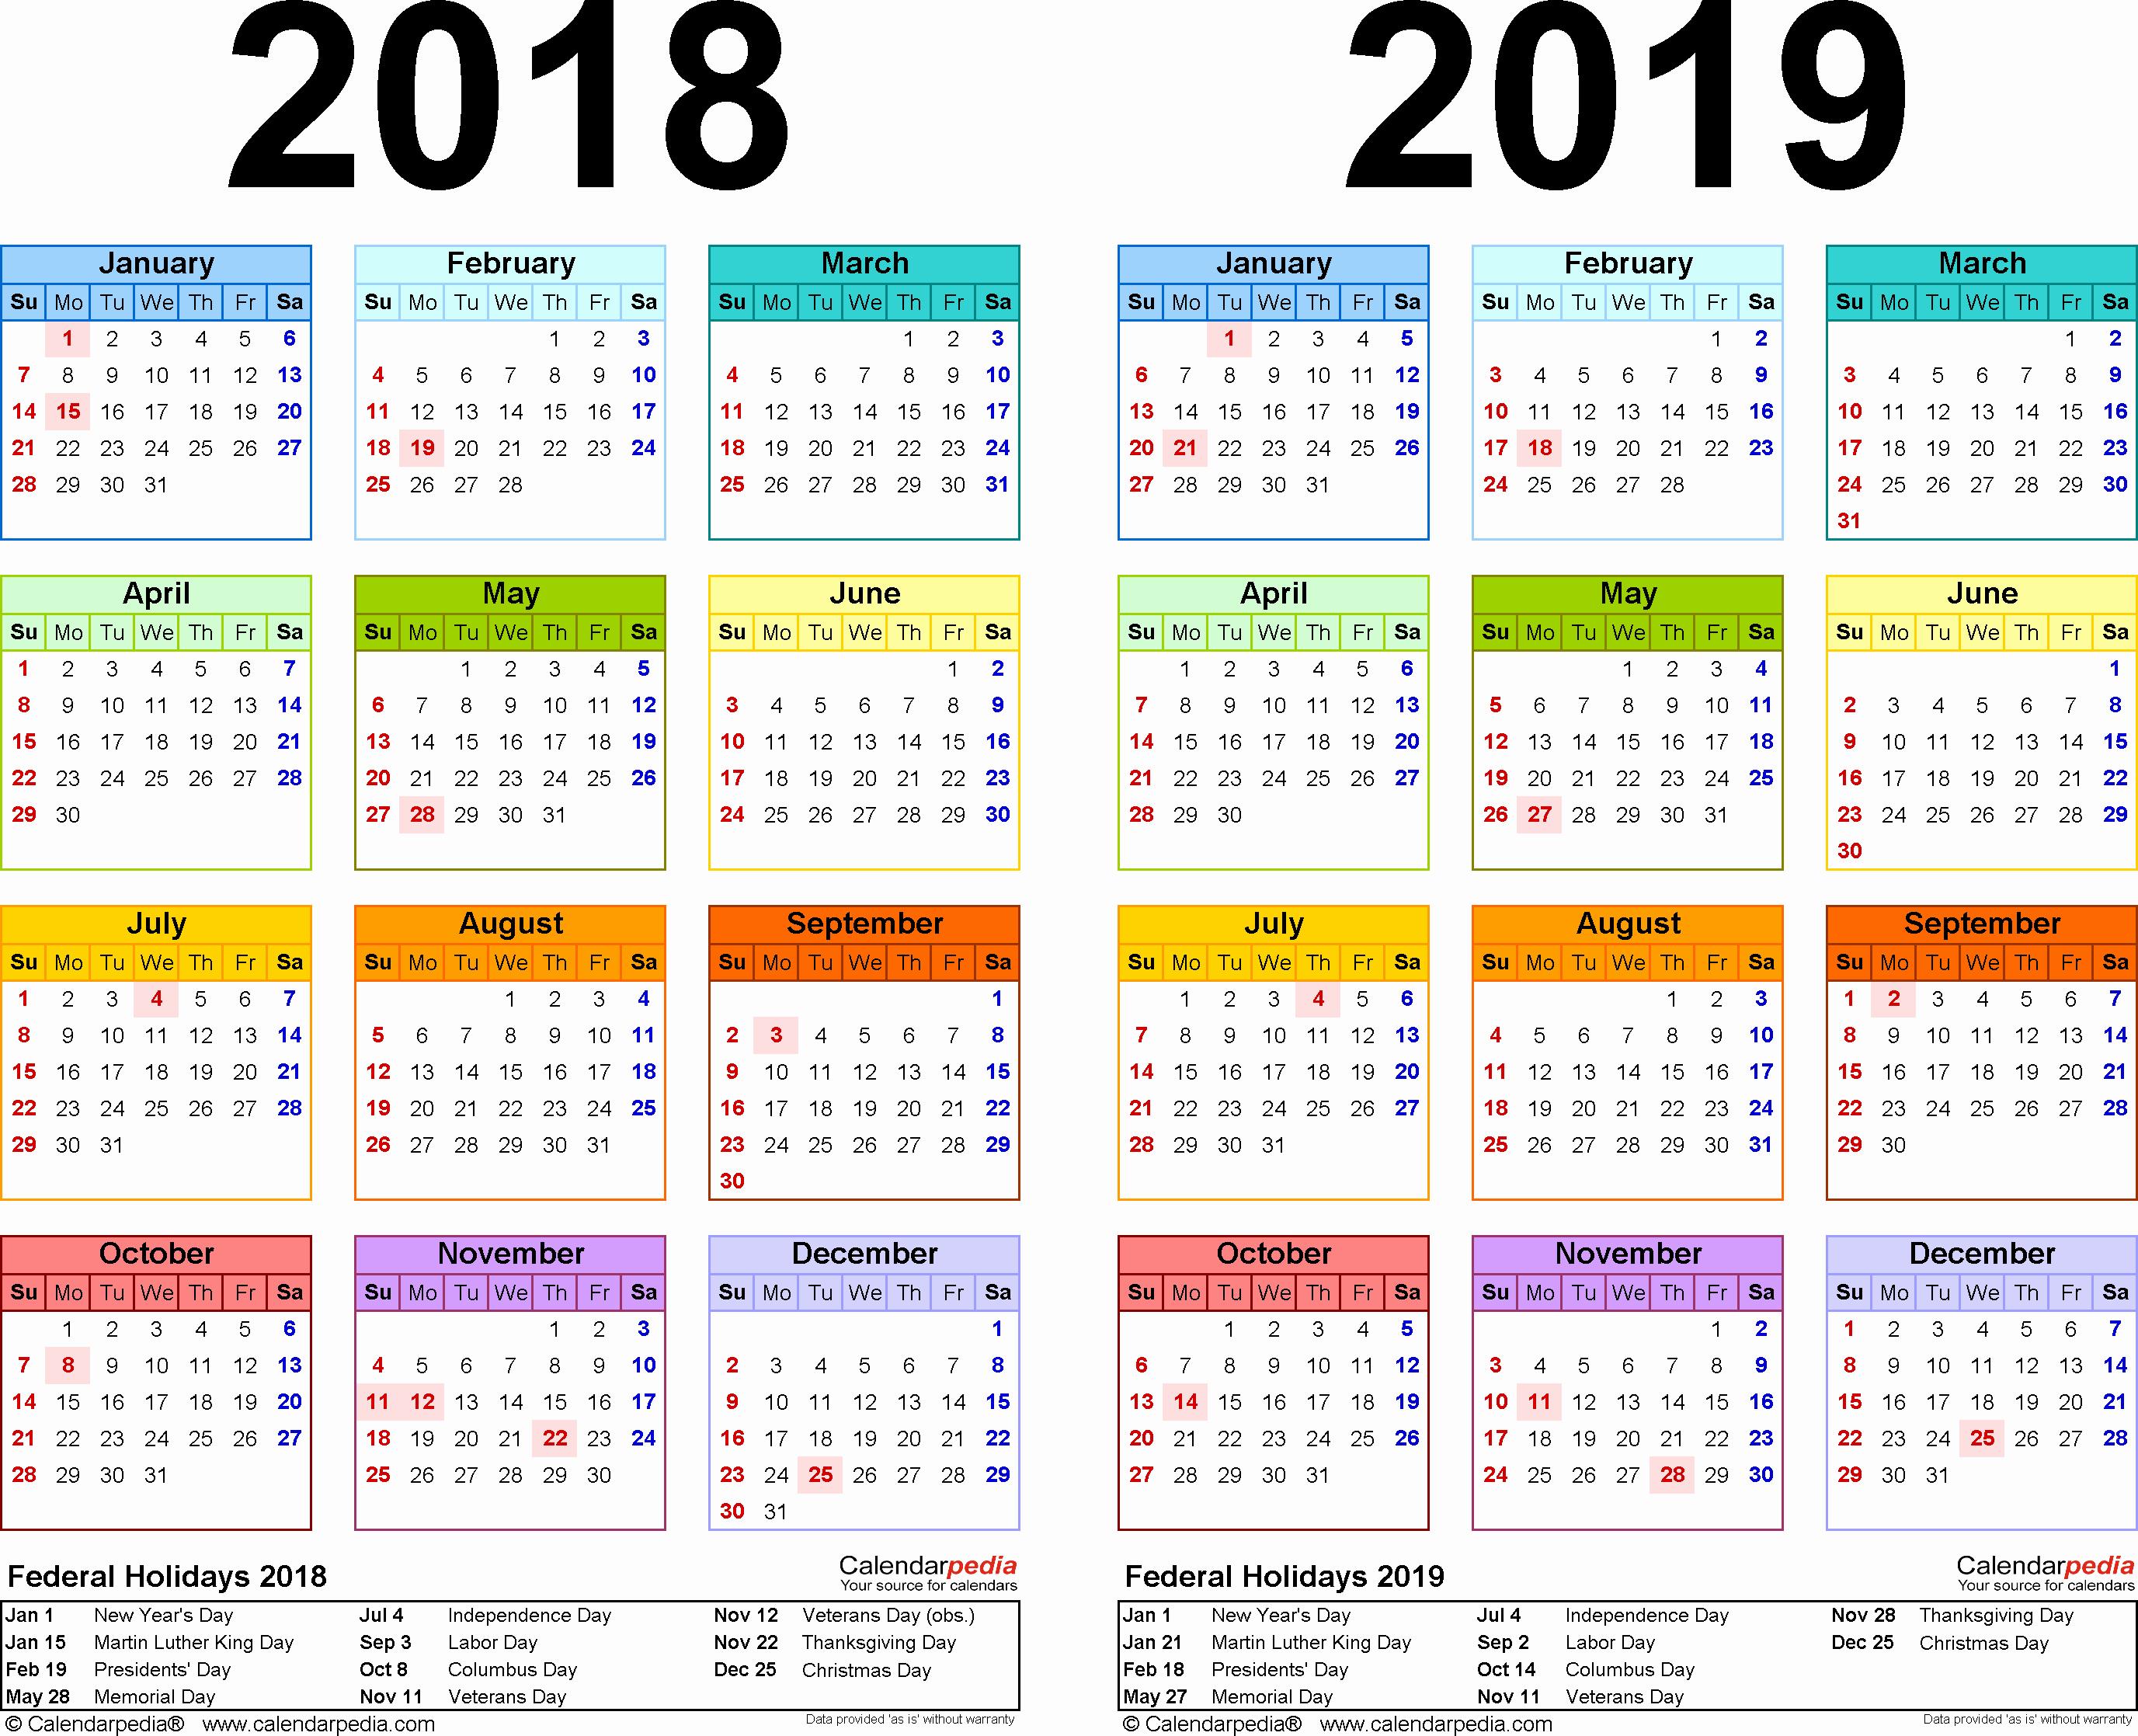 Printable Calendar 2018 and 2019 Fresh 2018 2019 Calendar Free Printable Two Year Pdf Calendars